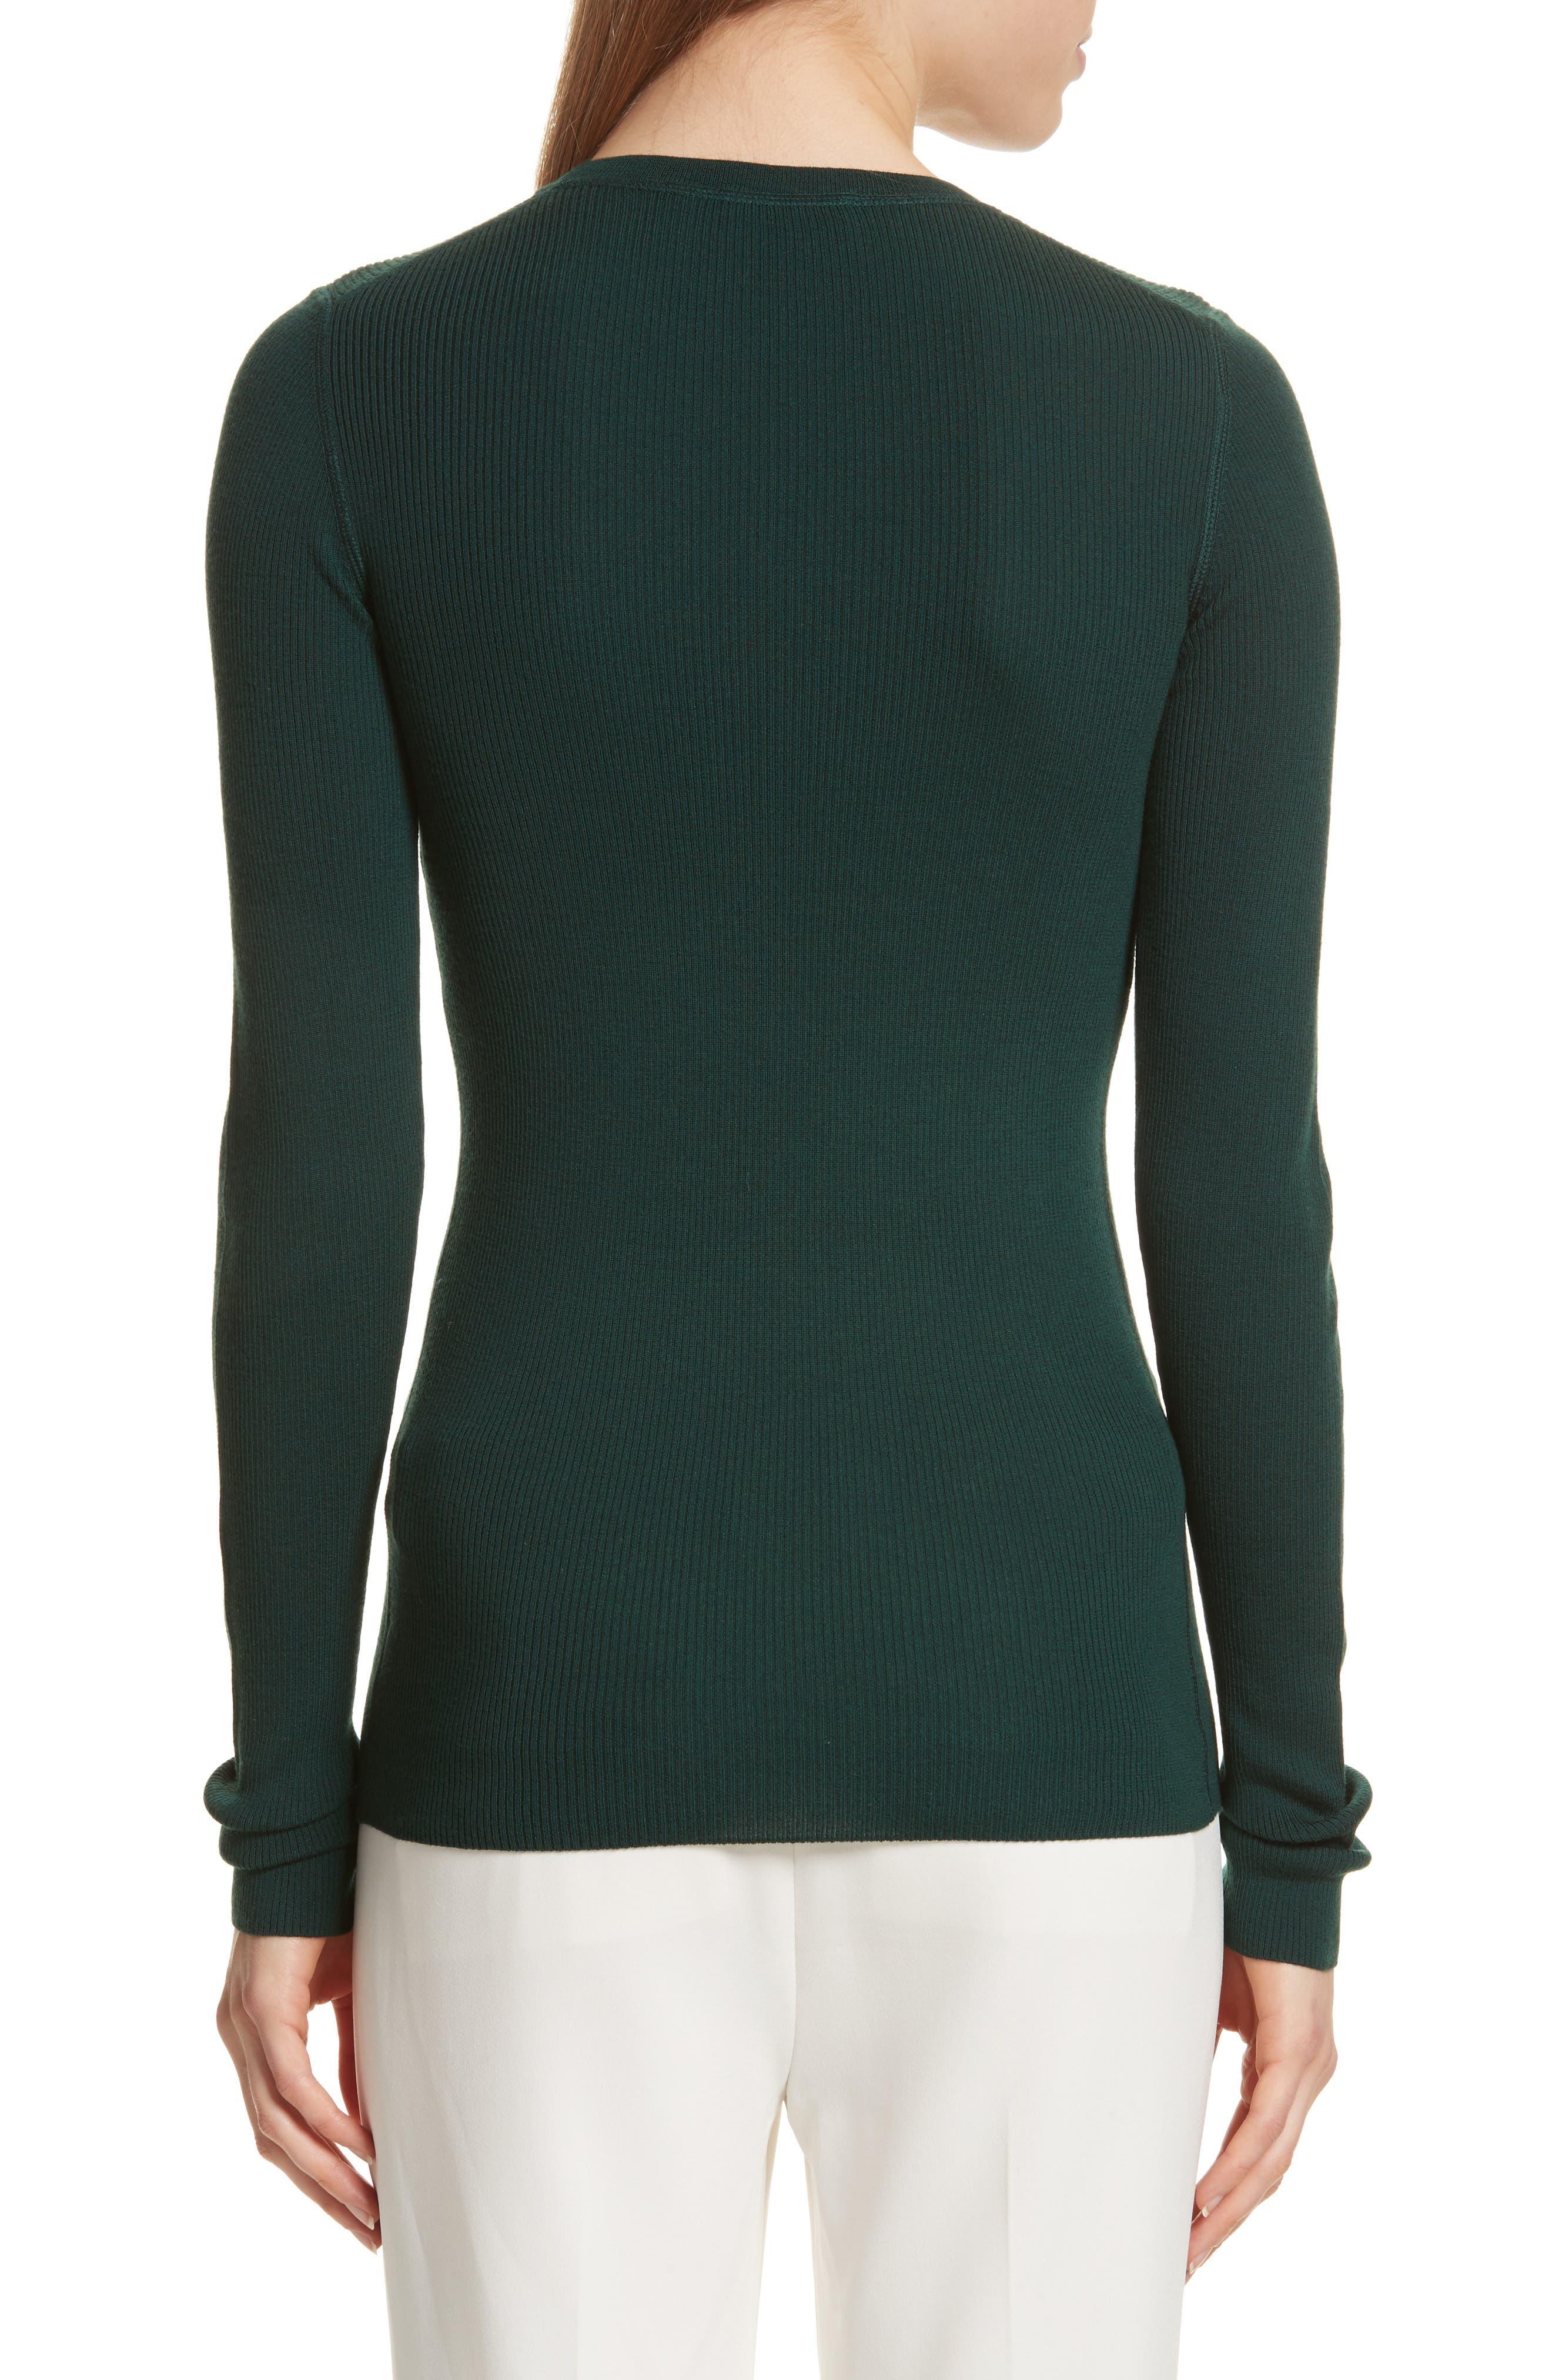 Mirzi Ribbed Sweater,                             Alternate thumbnail 2, color,                             308